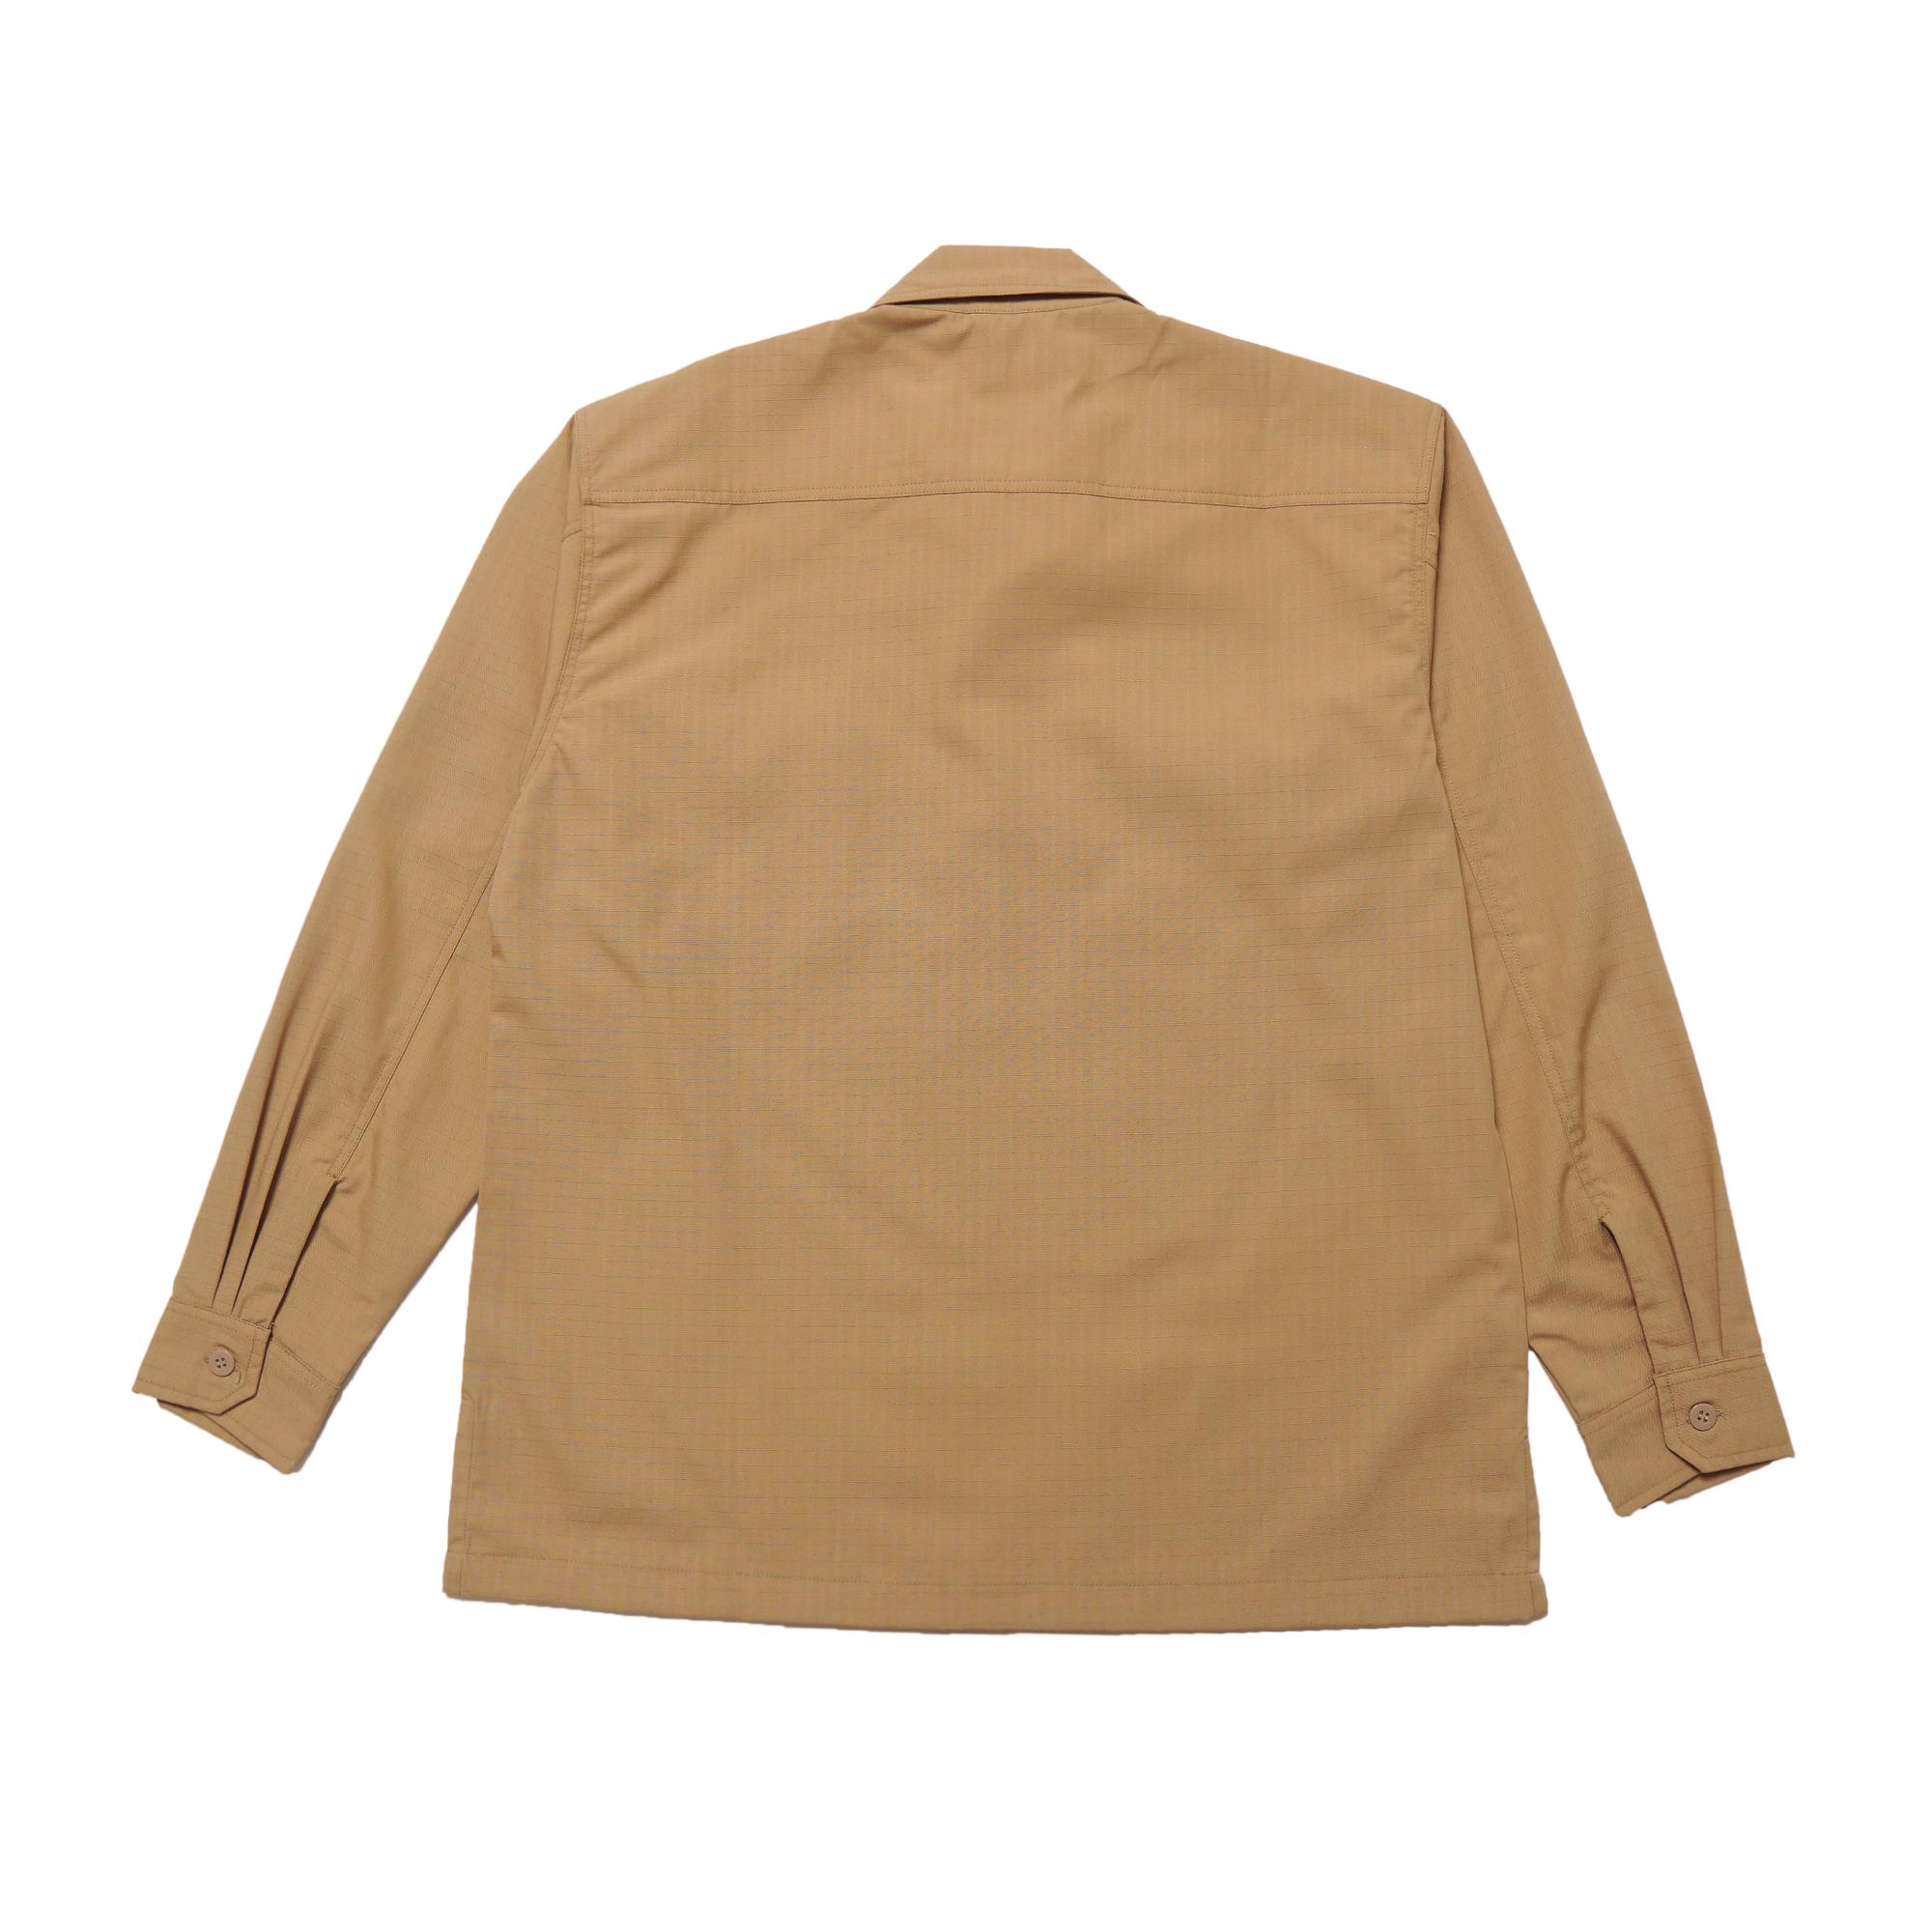 lawless-shirt-khaki-belakang